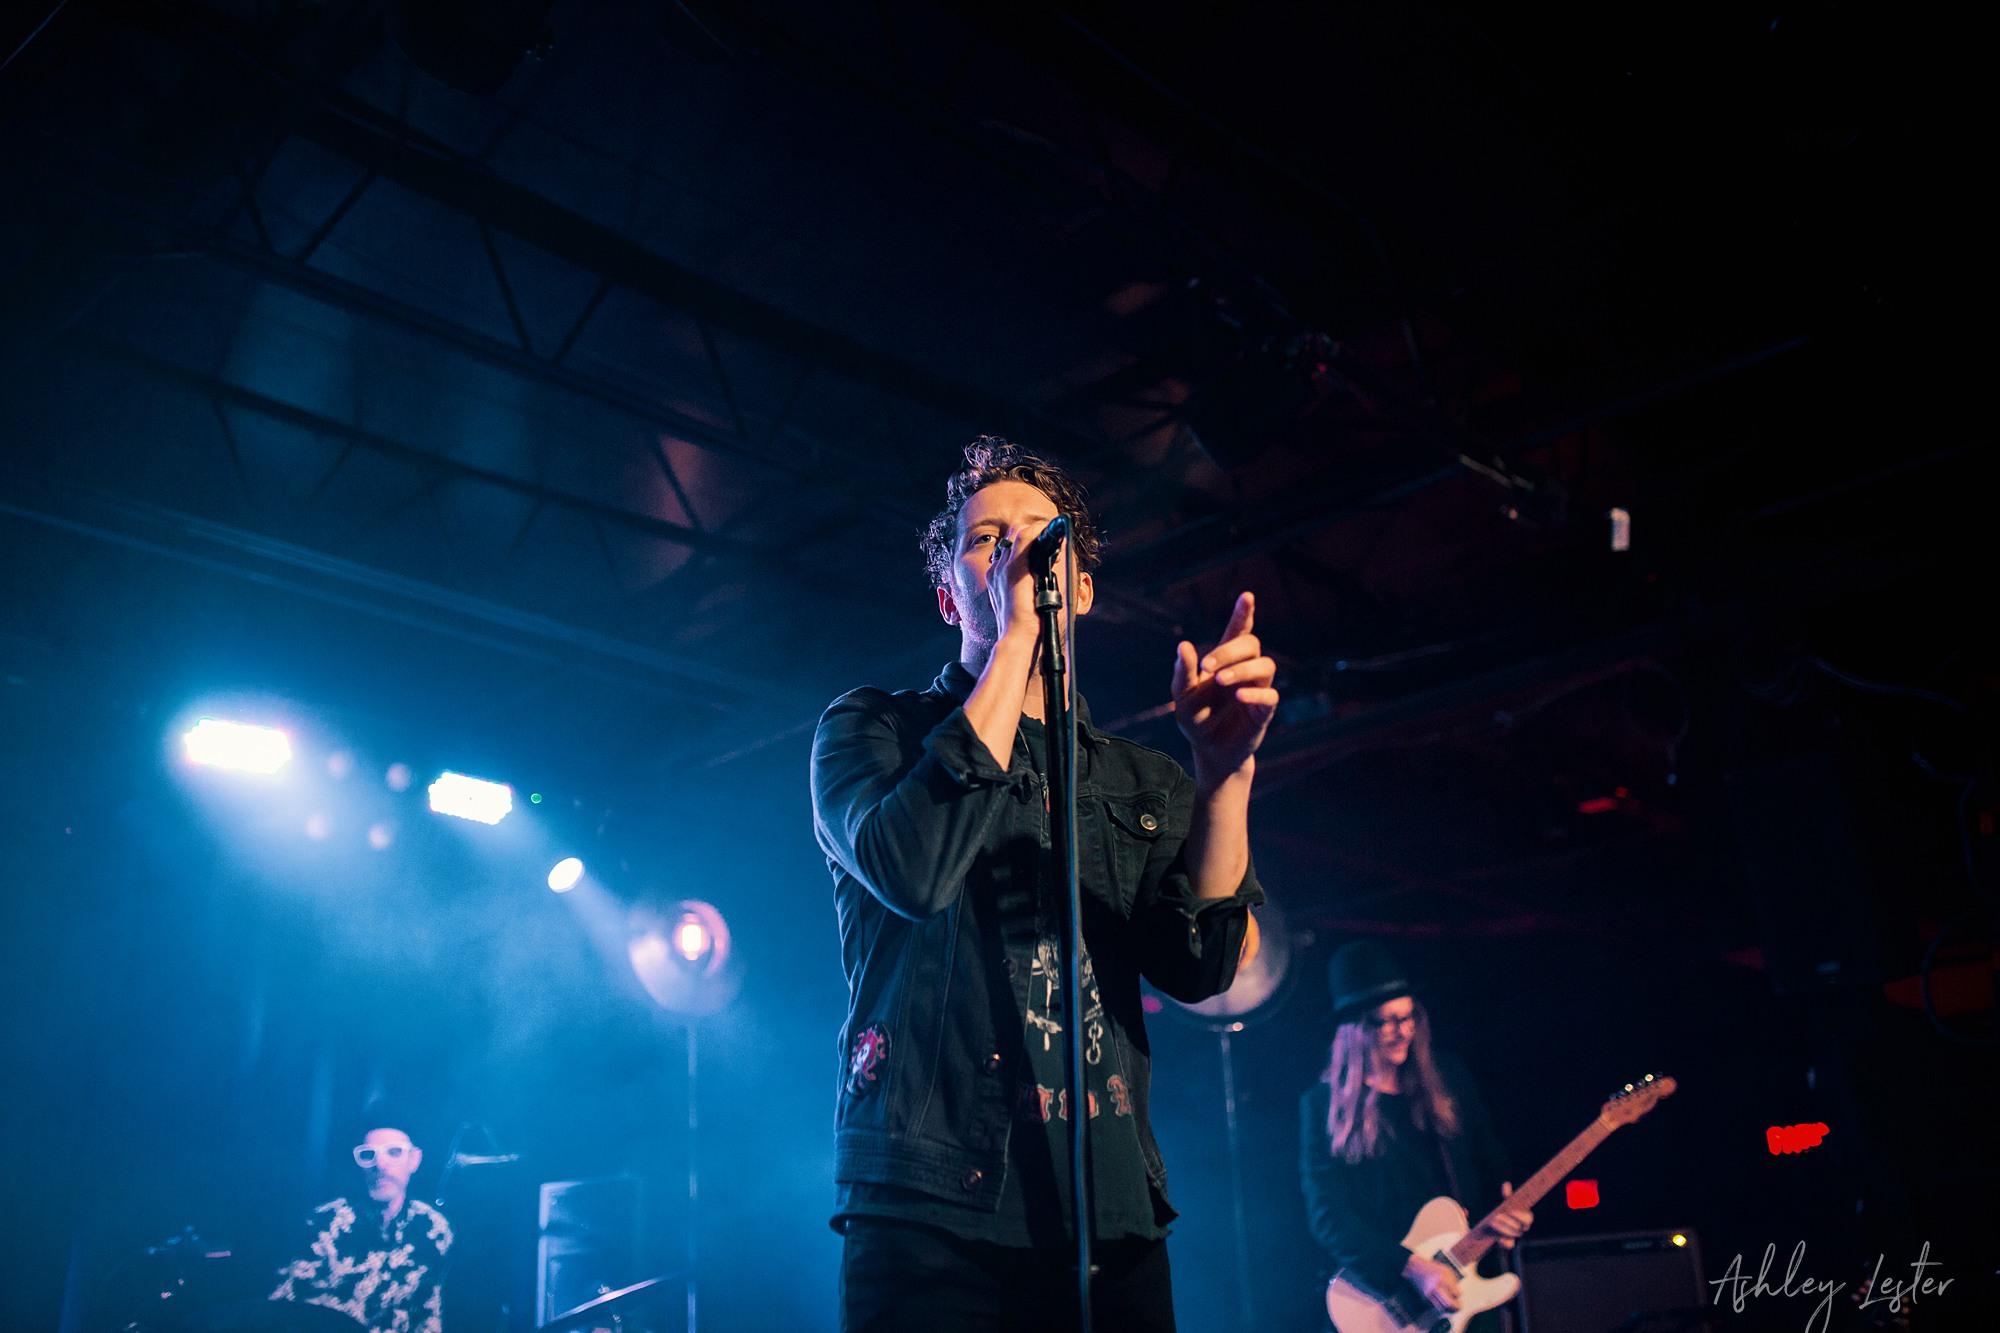 ConcertPhotographer-AndersonEast-AshleyLesterPhotography-CharlotteNC_0218.jpg